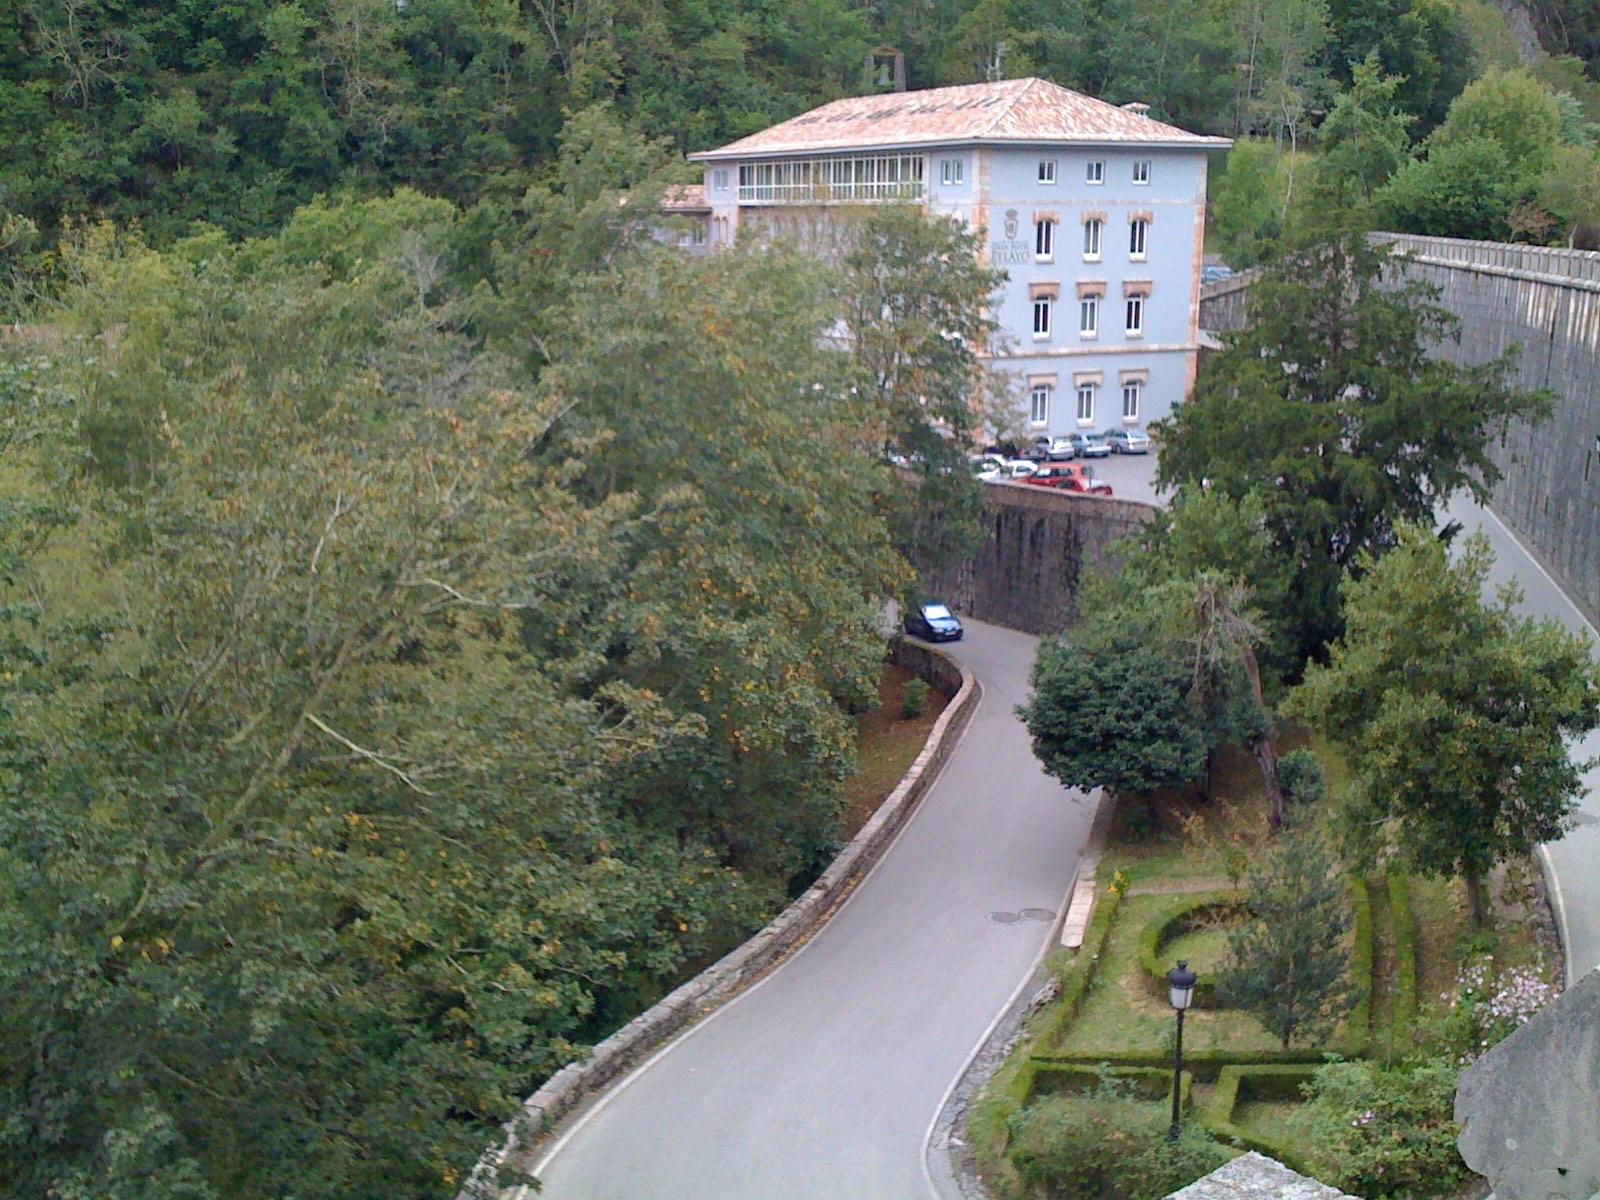 Hotel Pelayo, Covadonga